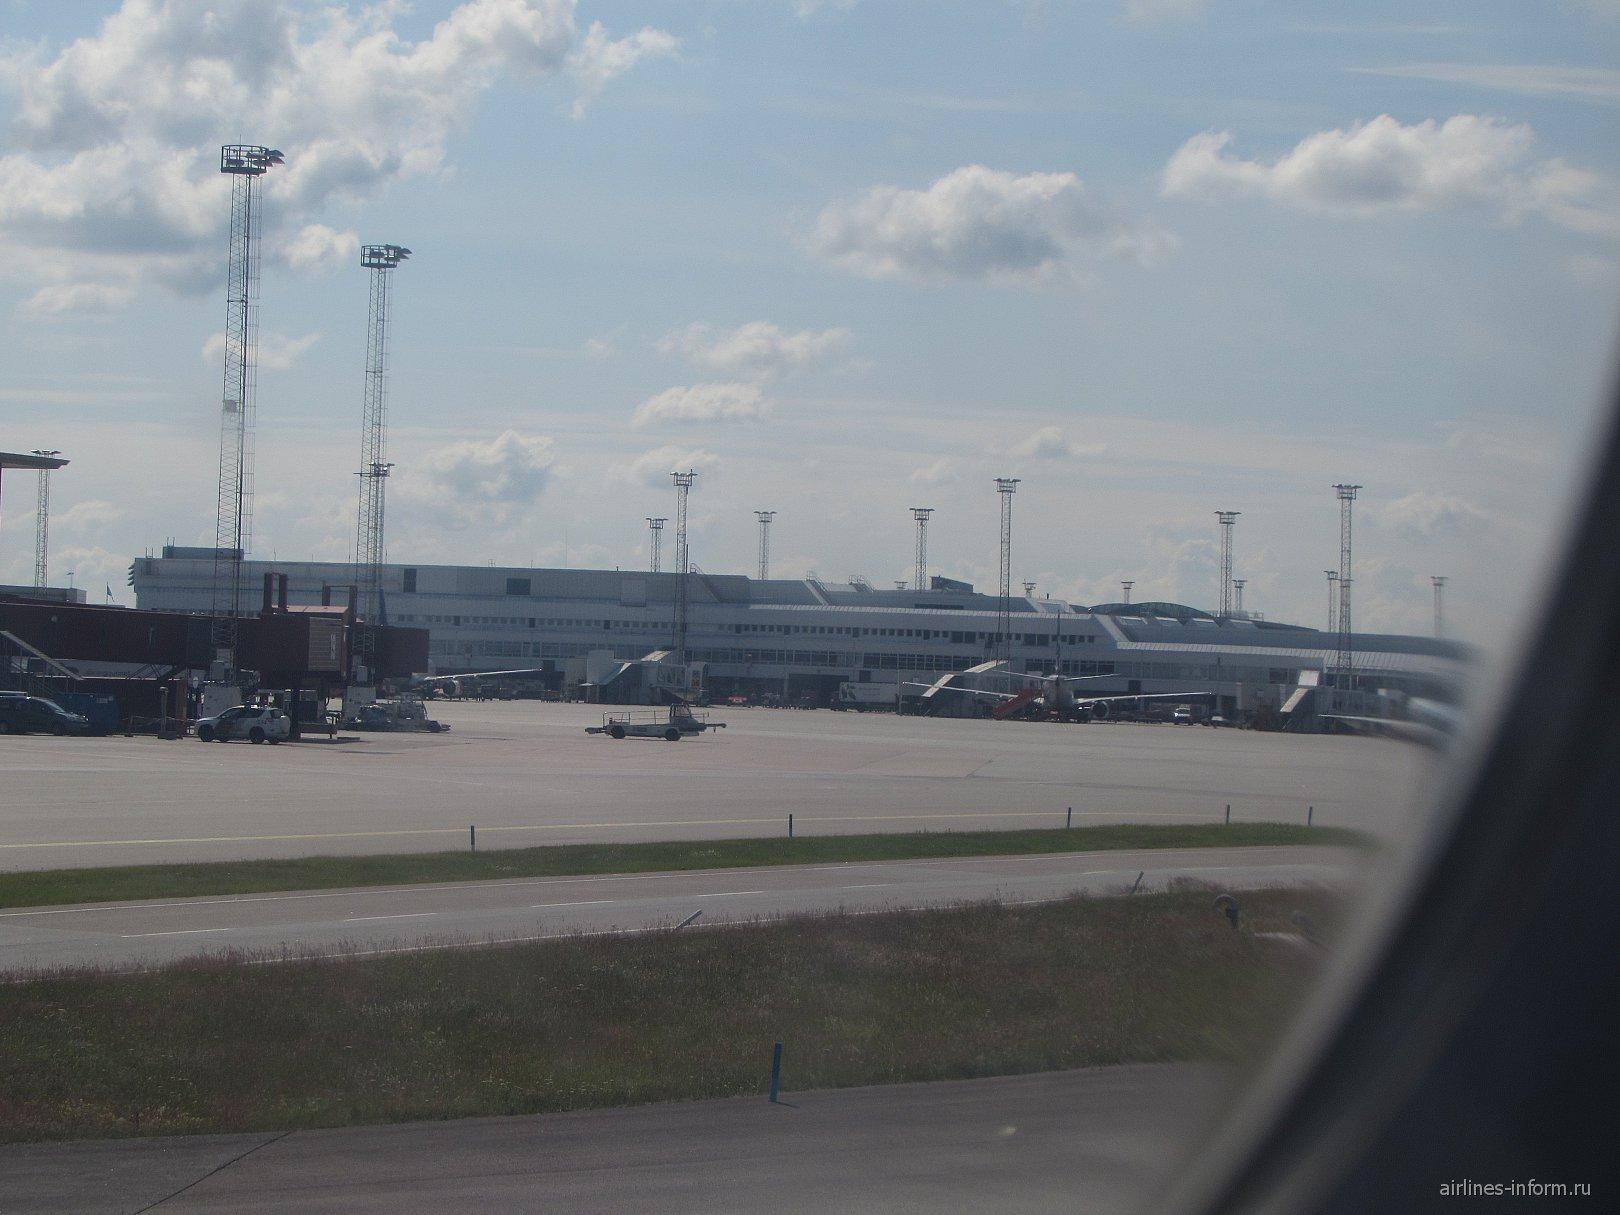 Вид на Терминал 4 аэропорта Арланда